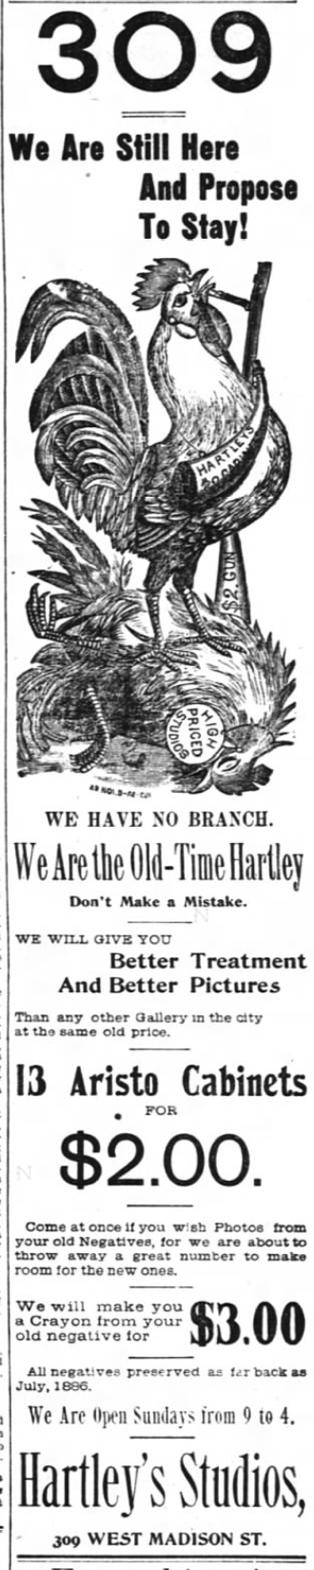 1894 Feb 4 OLD HARTLEY advert The Inter Ocean